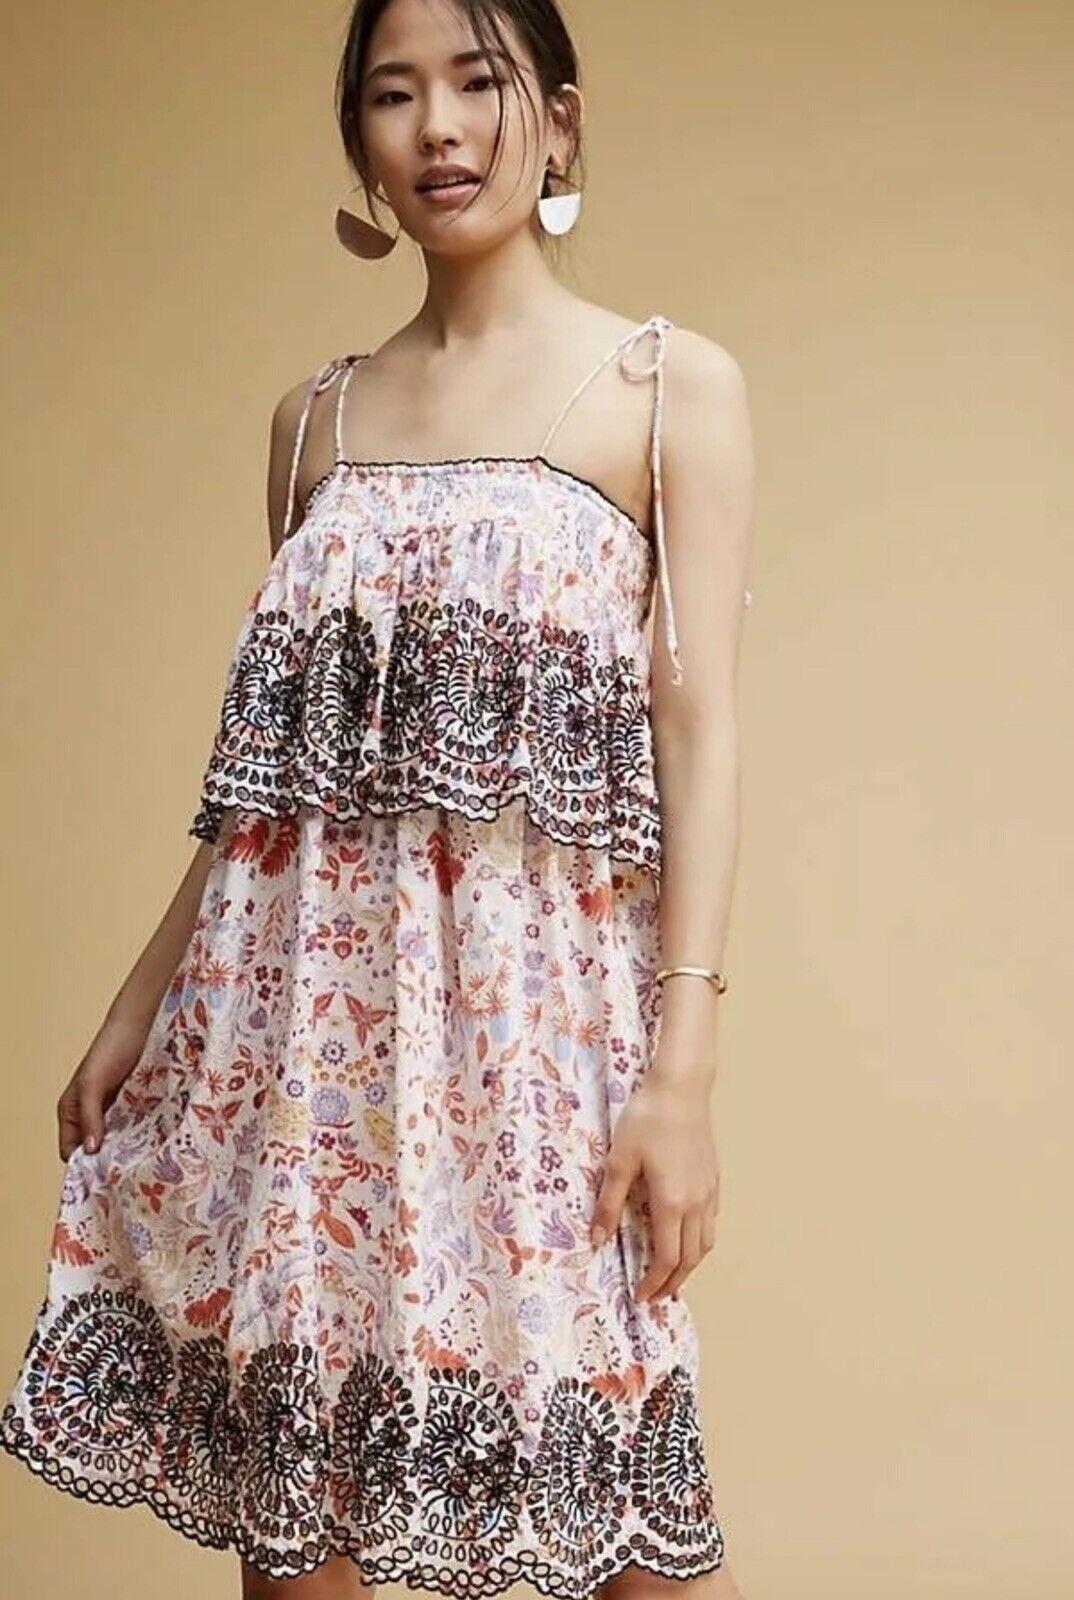 NWOT   Anthropologie Samsa Embroidered Sundress Antik Batik Floral-sz Small